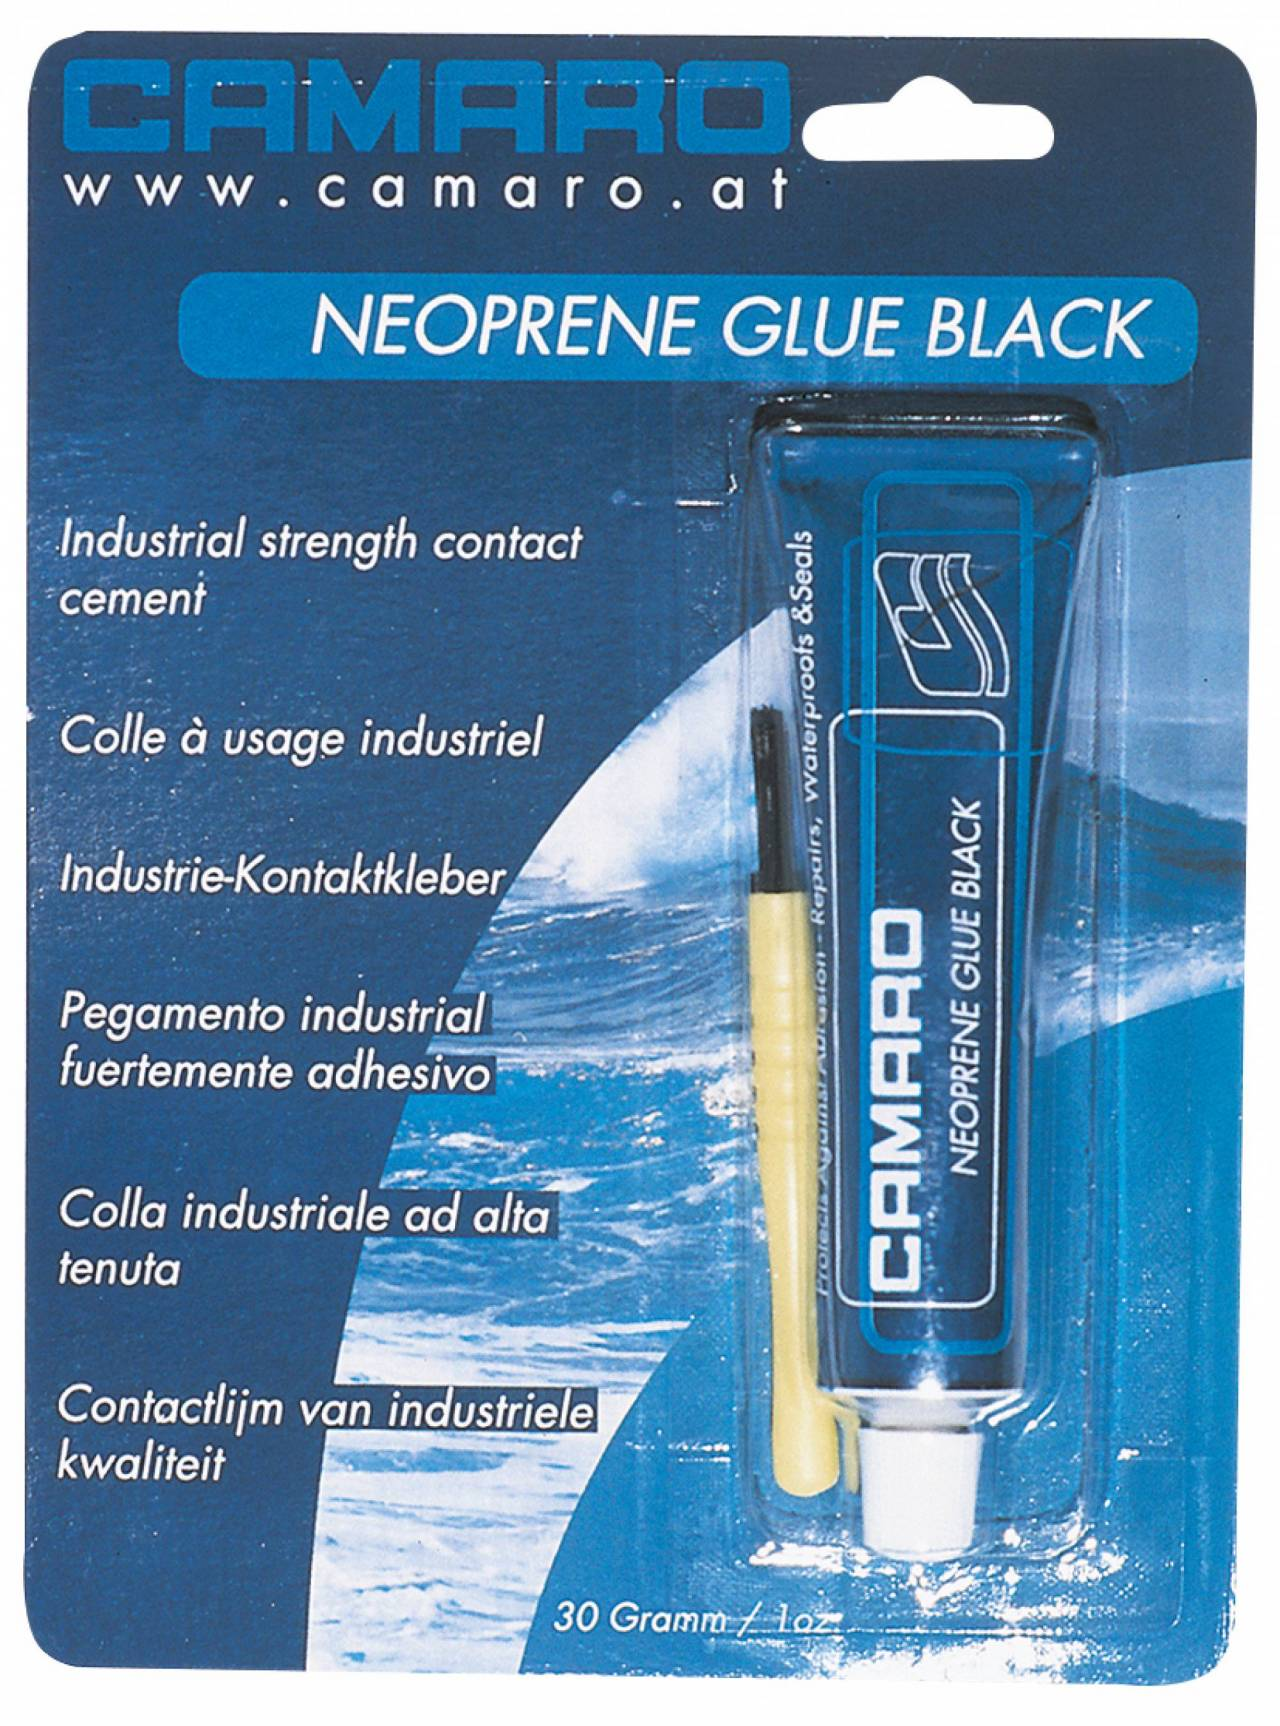 NEOPREN GLUE BLACK